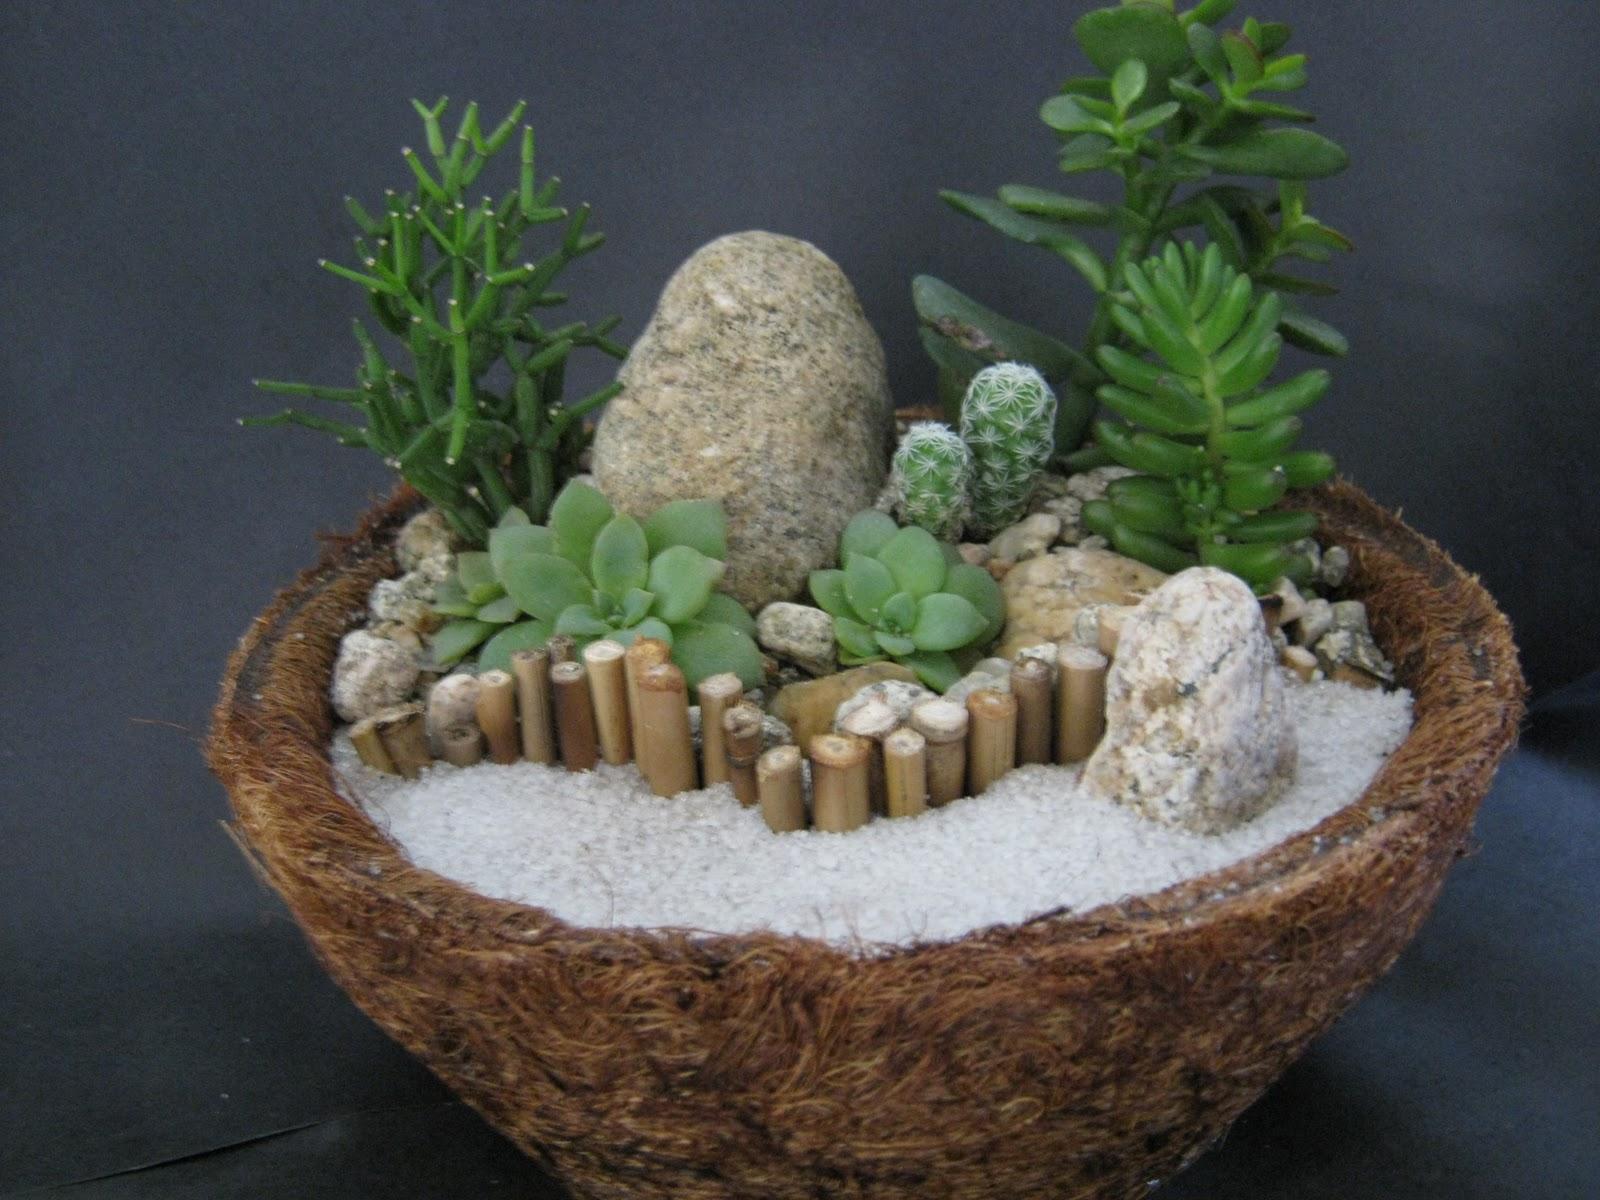 mini jardim suculentas:Claudio Lourenço Paisagismo: Mini-Jardins de Suculentas em Jarro de